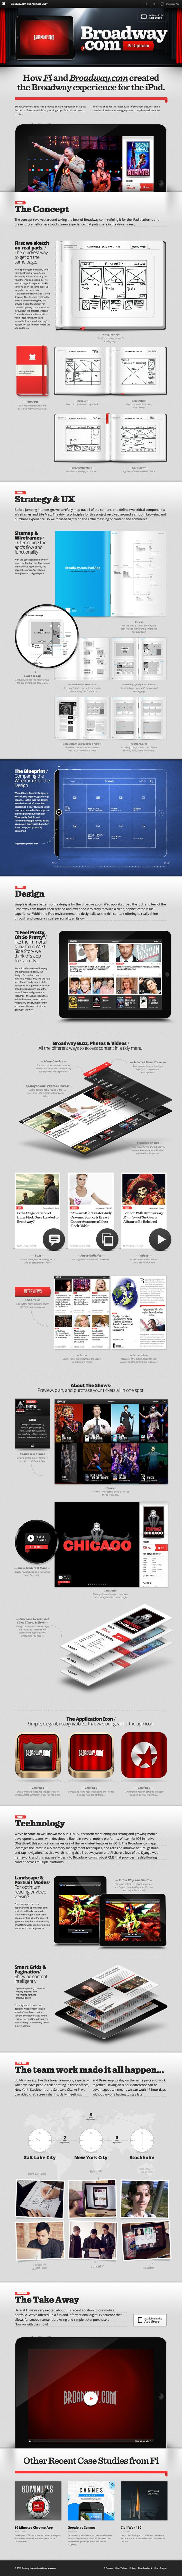 Broadway.com iPad app case study.